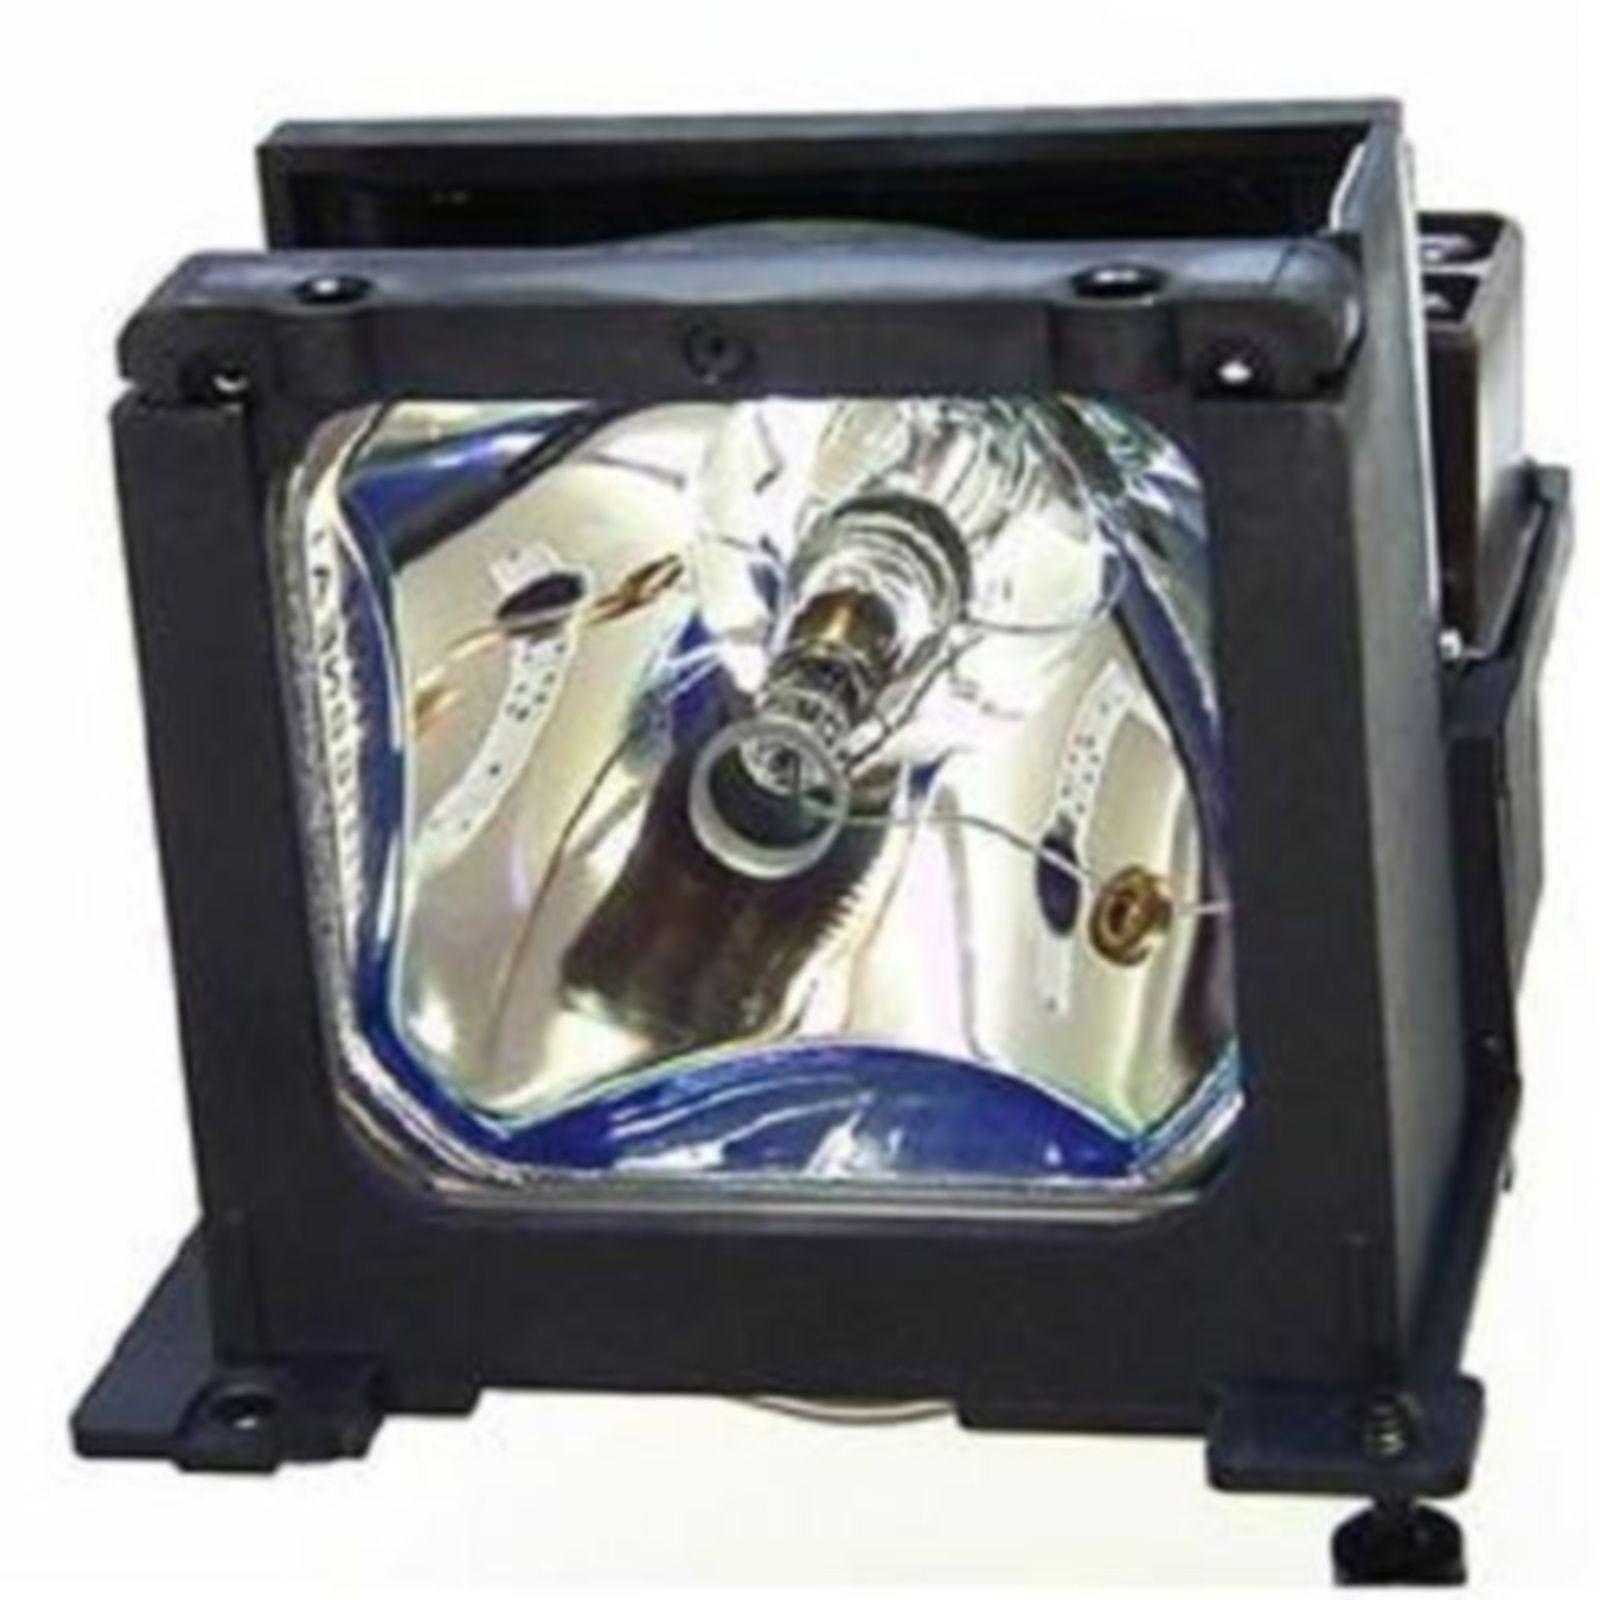 NEC VT-50LP VT50LP 50021408 VT-40LP VT40LP OEM FACTORY ORIGINAL LAMP IN HOUSING